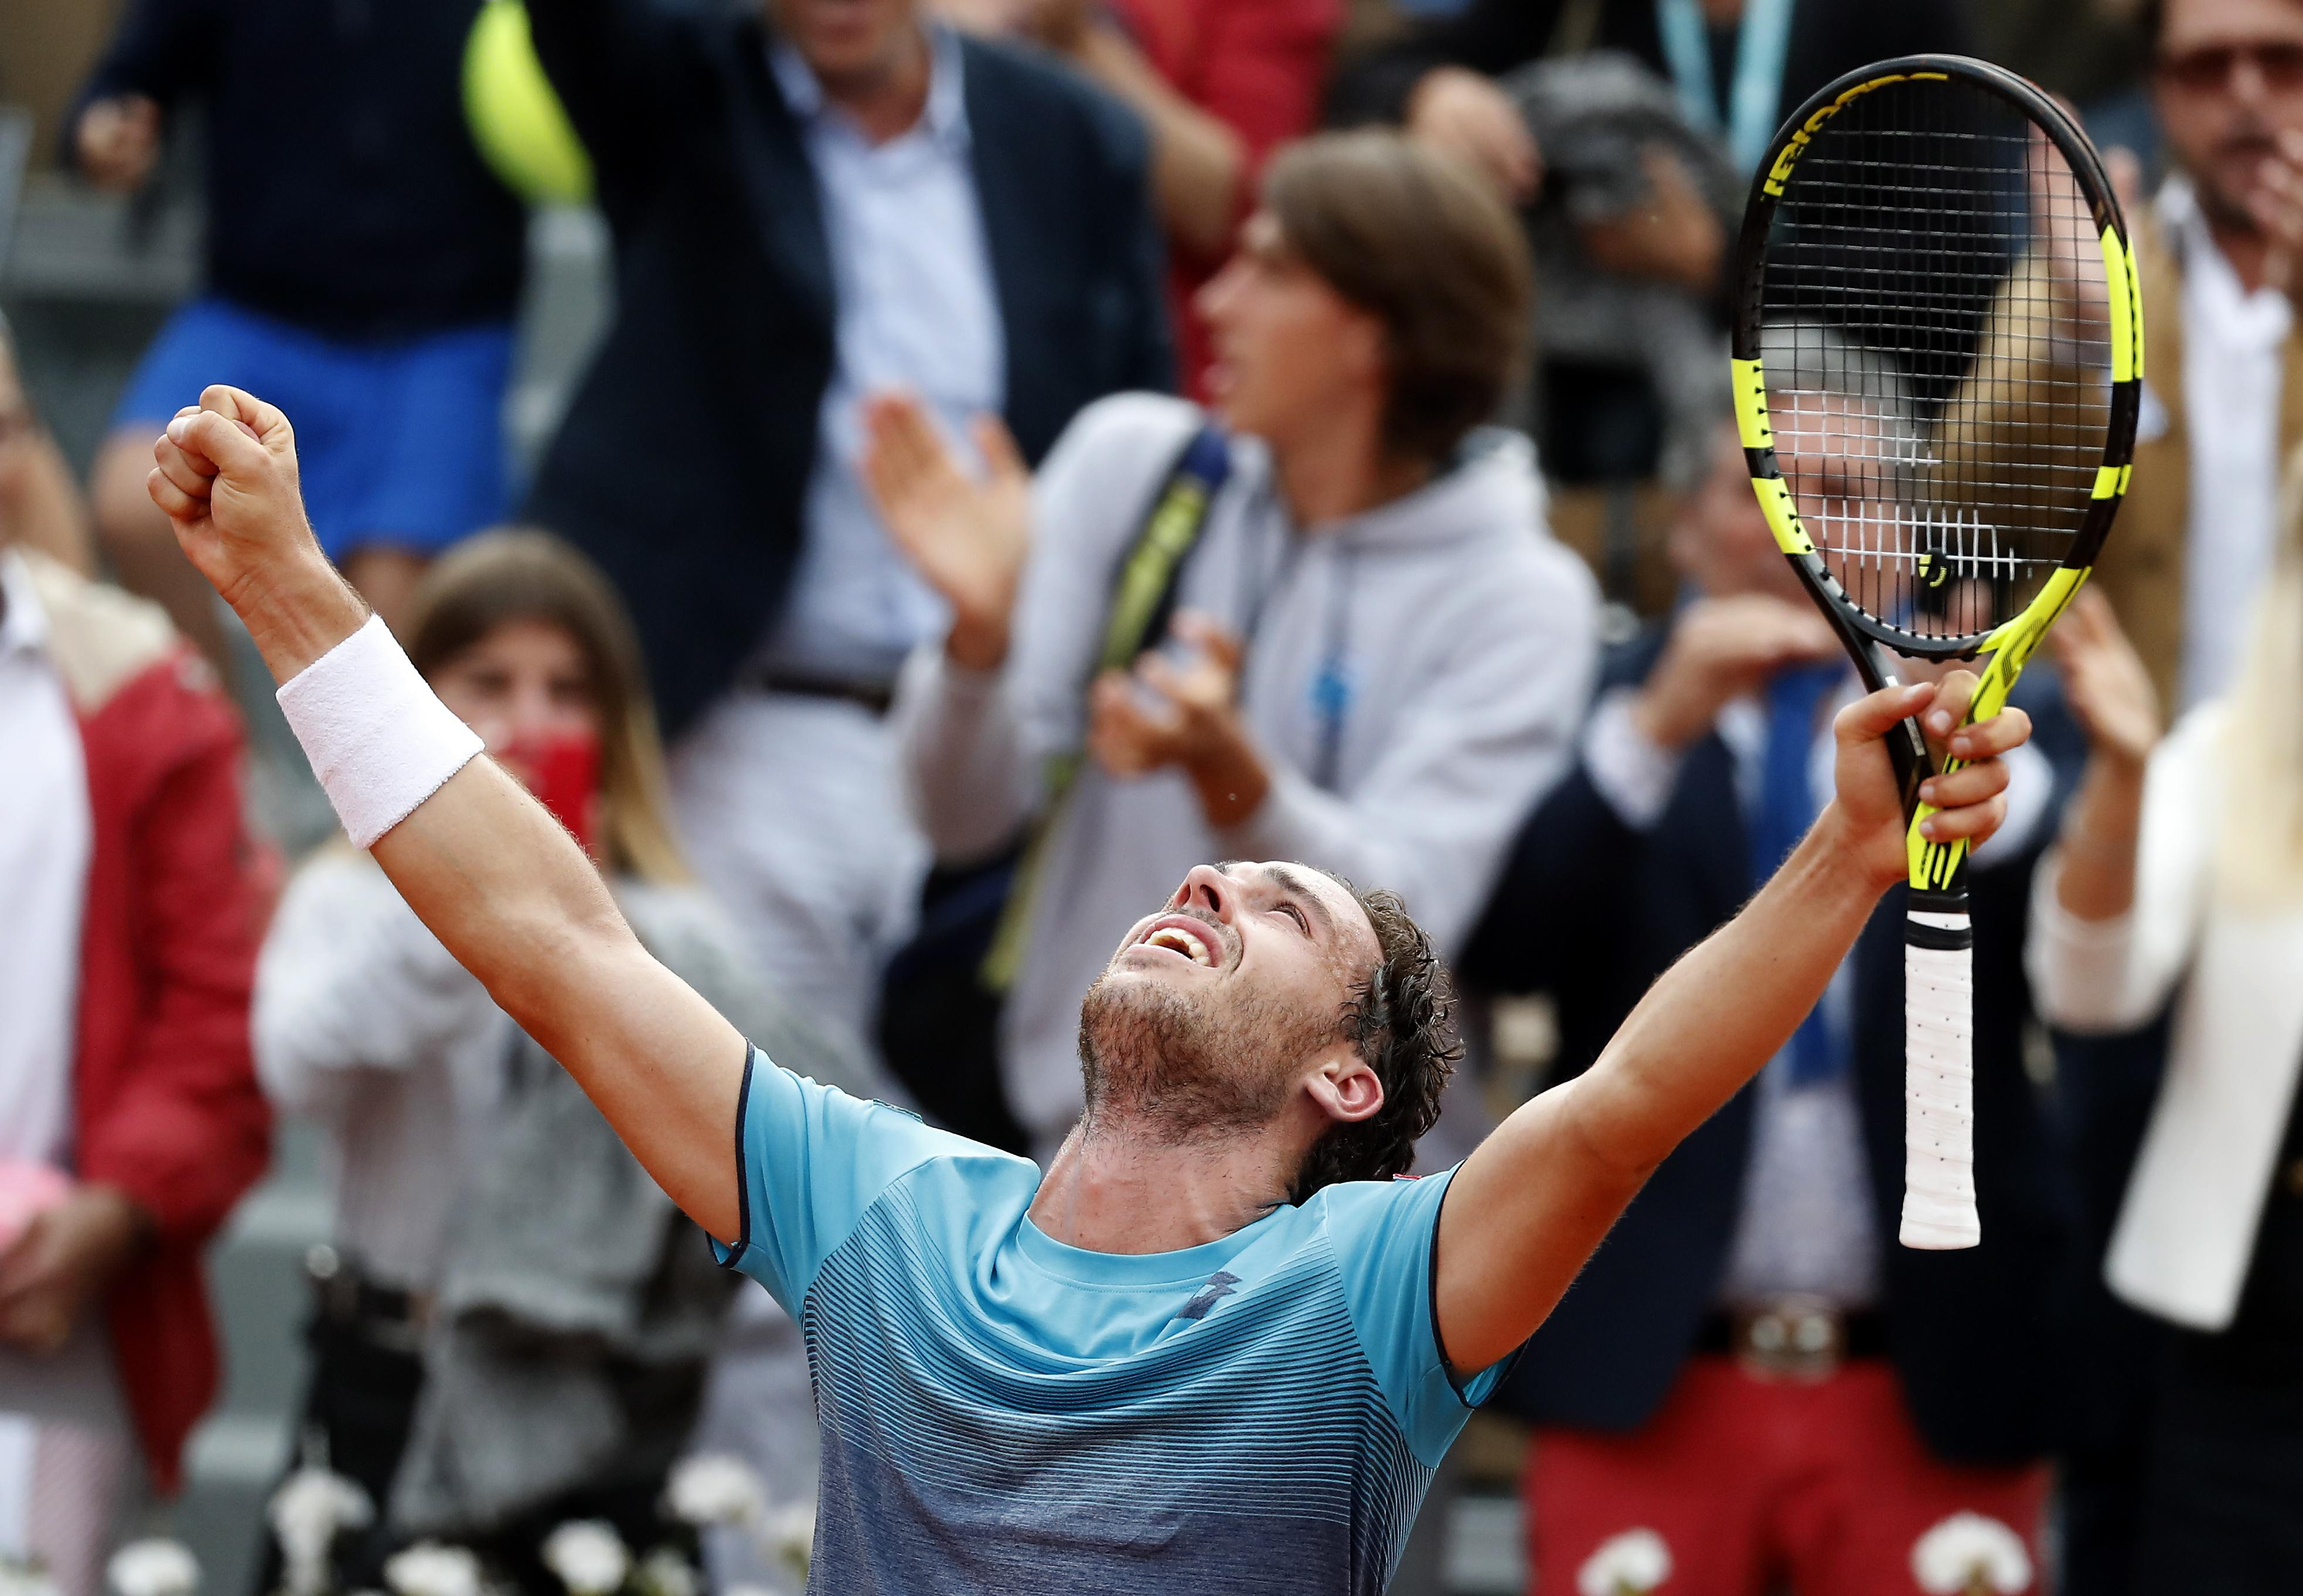 Cecchinato is the first Italian to reach a Grand Slam semi final in 40 years